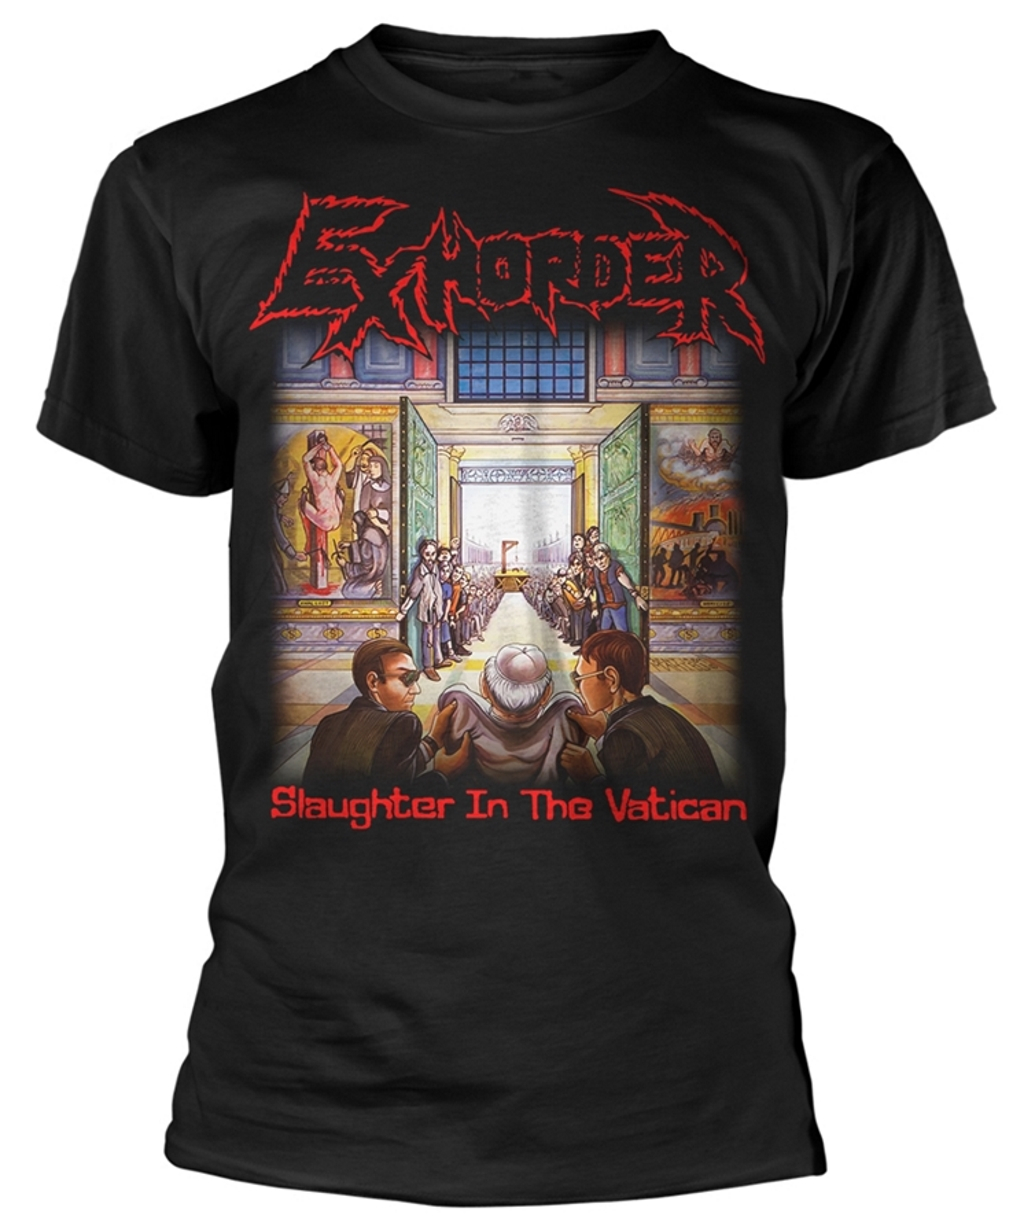 Slaughter in the Vatican T-Shirt EXHORDER